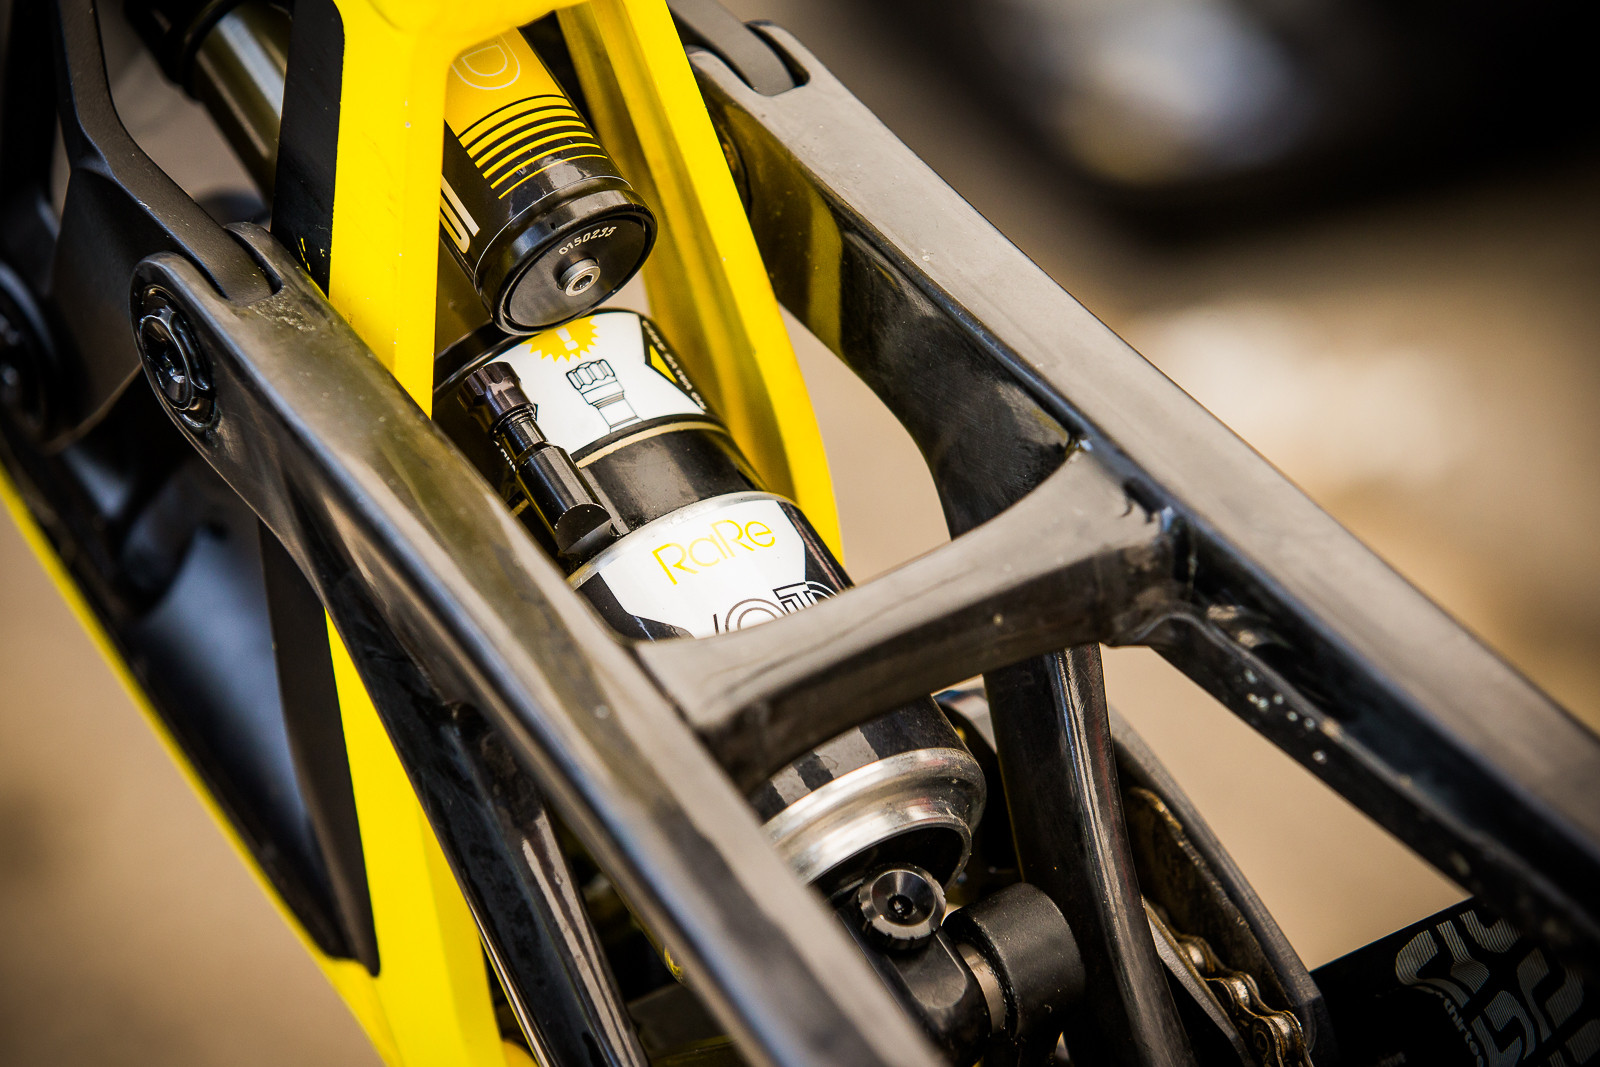 BOS RaRe Rear Shock - PIT BITS - World Cup Lenzerheide, Switzerland - Mountain Biking Pictures - Vital MTB